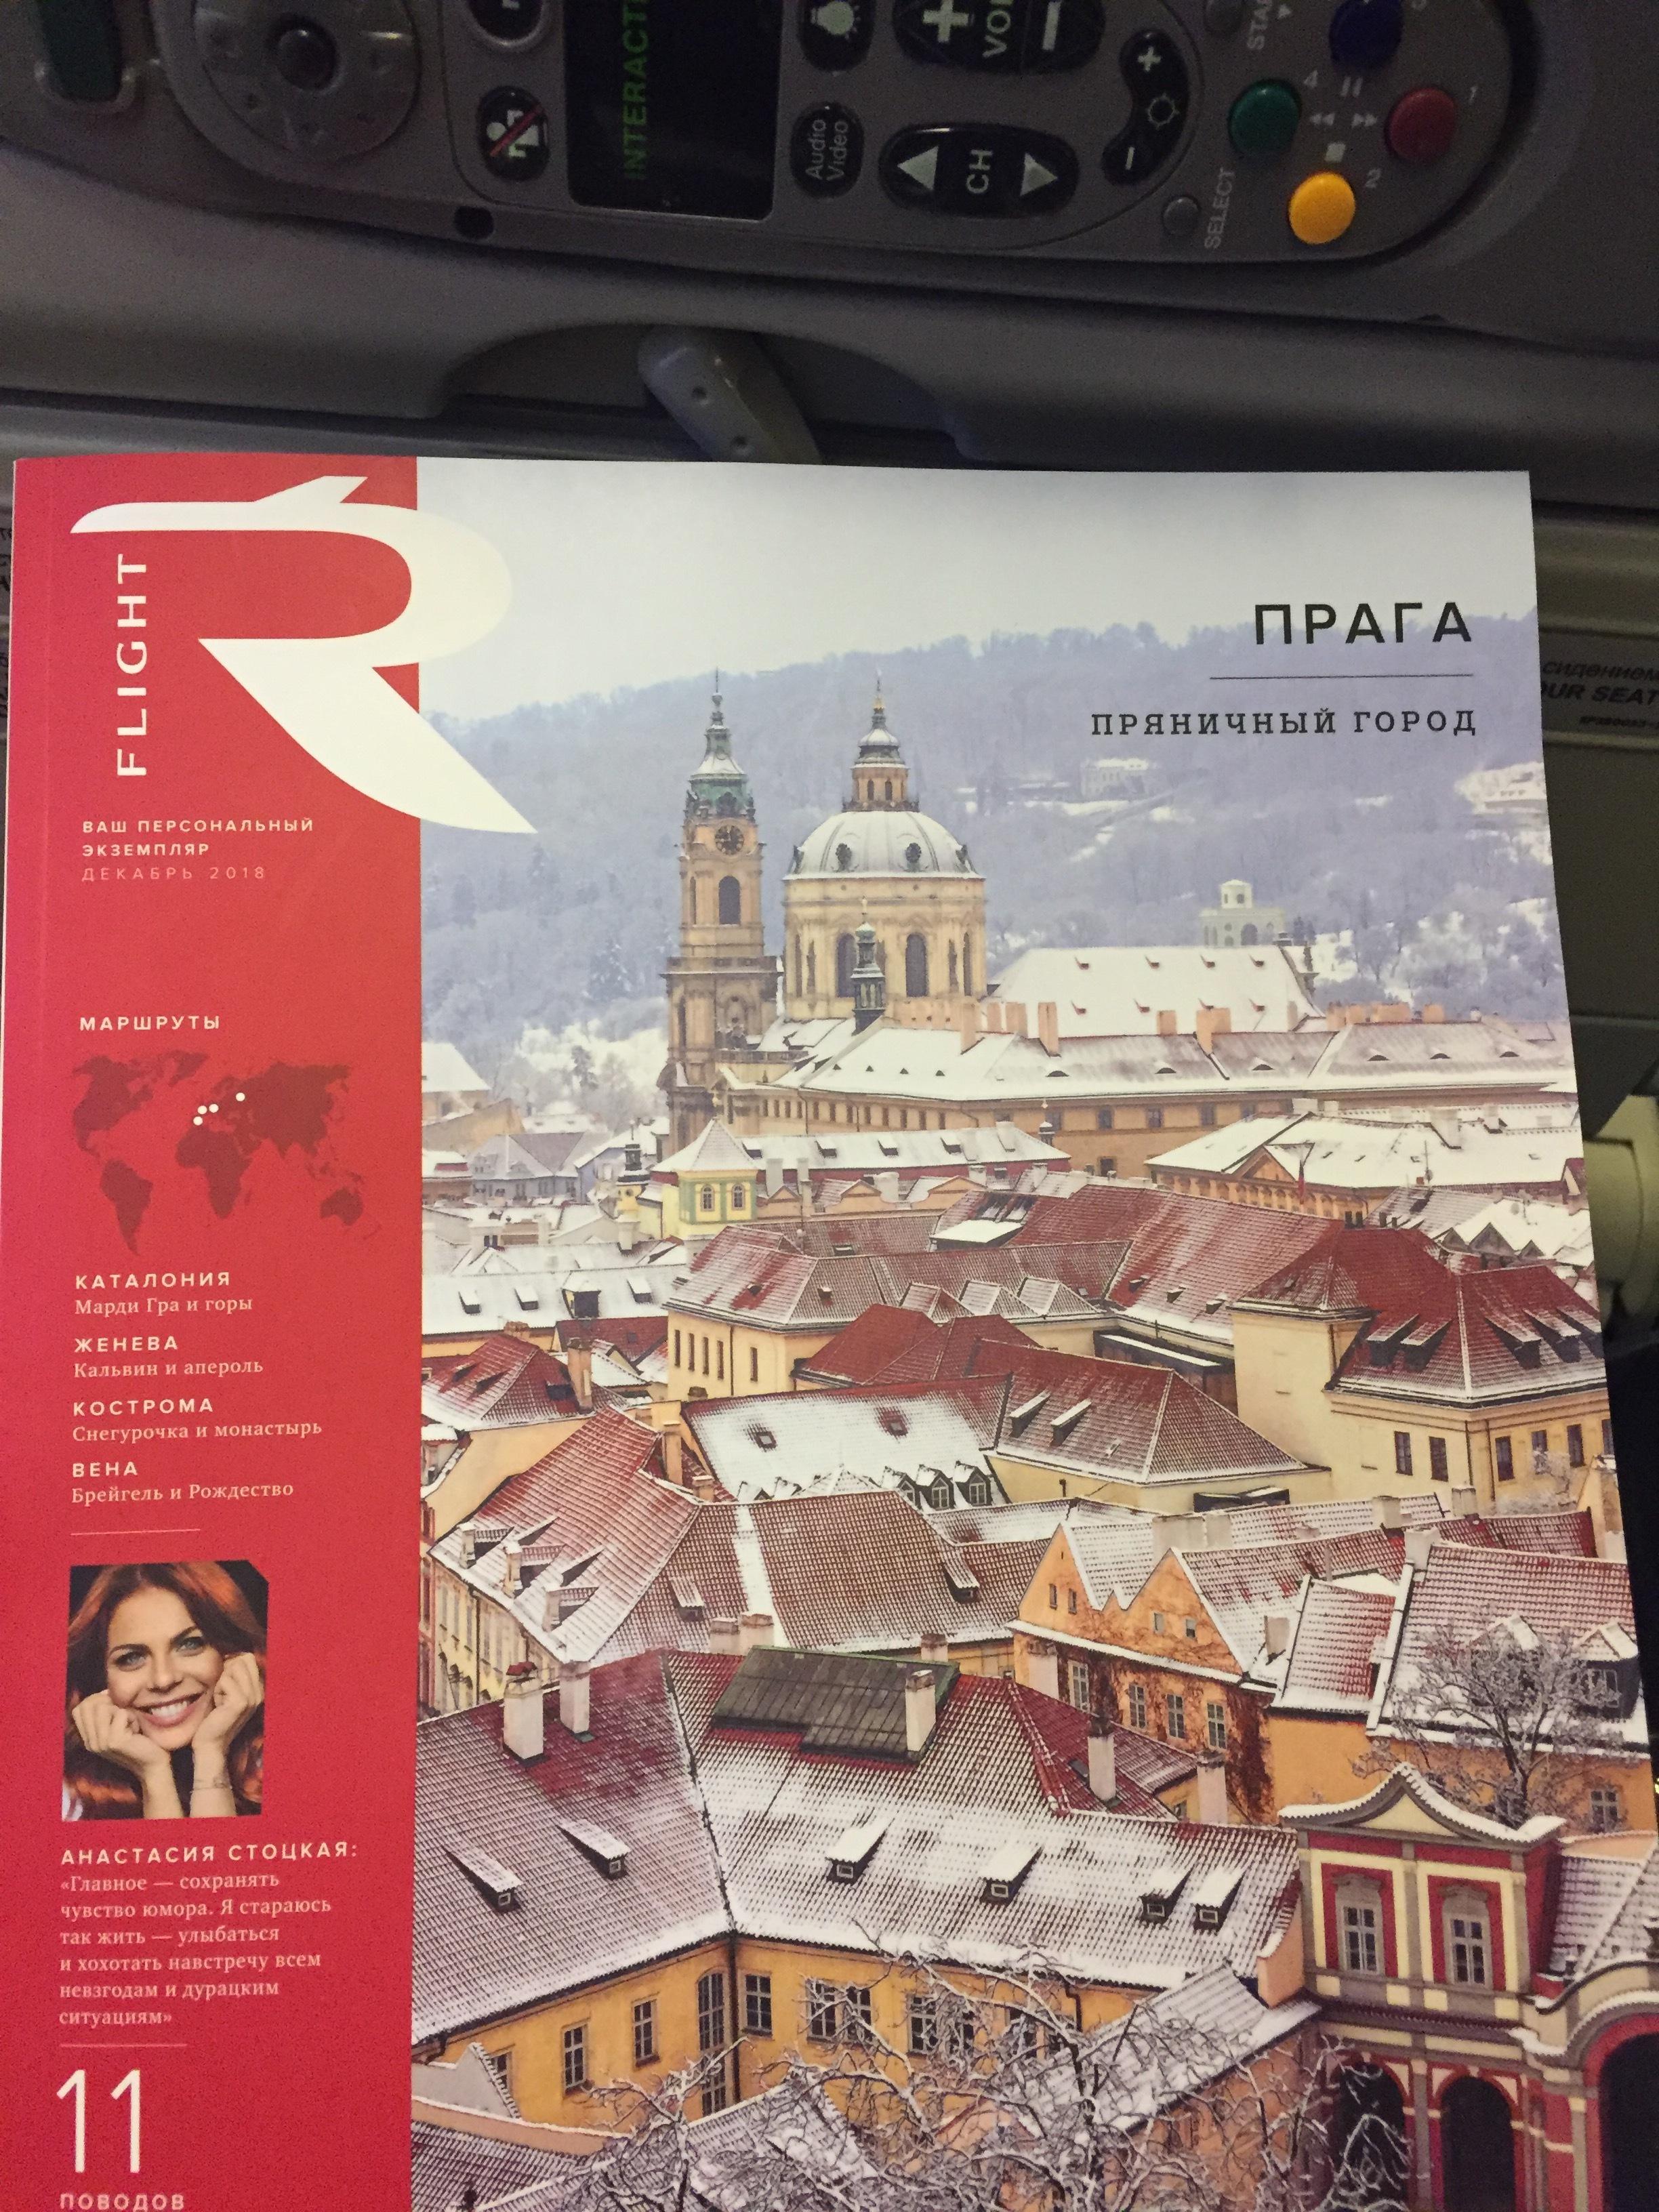 rossiya inflight magazine.JPG